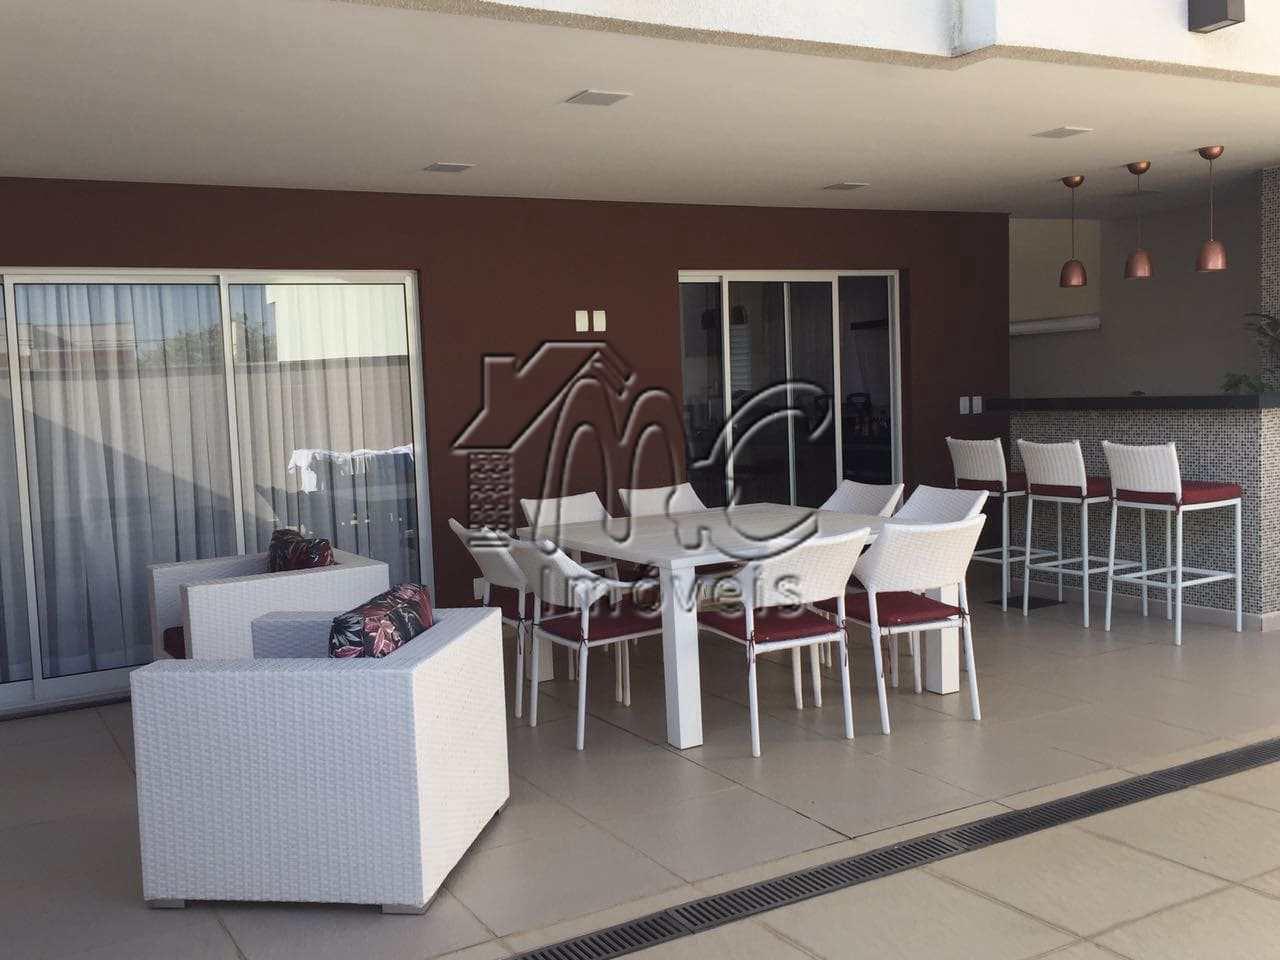 Sobrado de Condomínio com 3 dorms, Ibiti Royal Park, Sorocaba - R$ 990 mil, Cod: 11